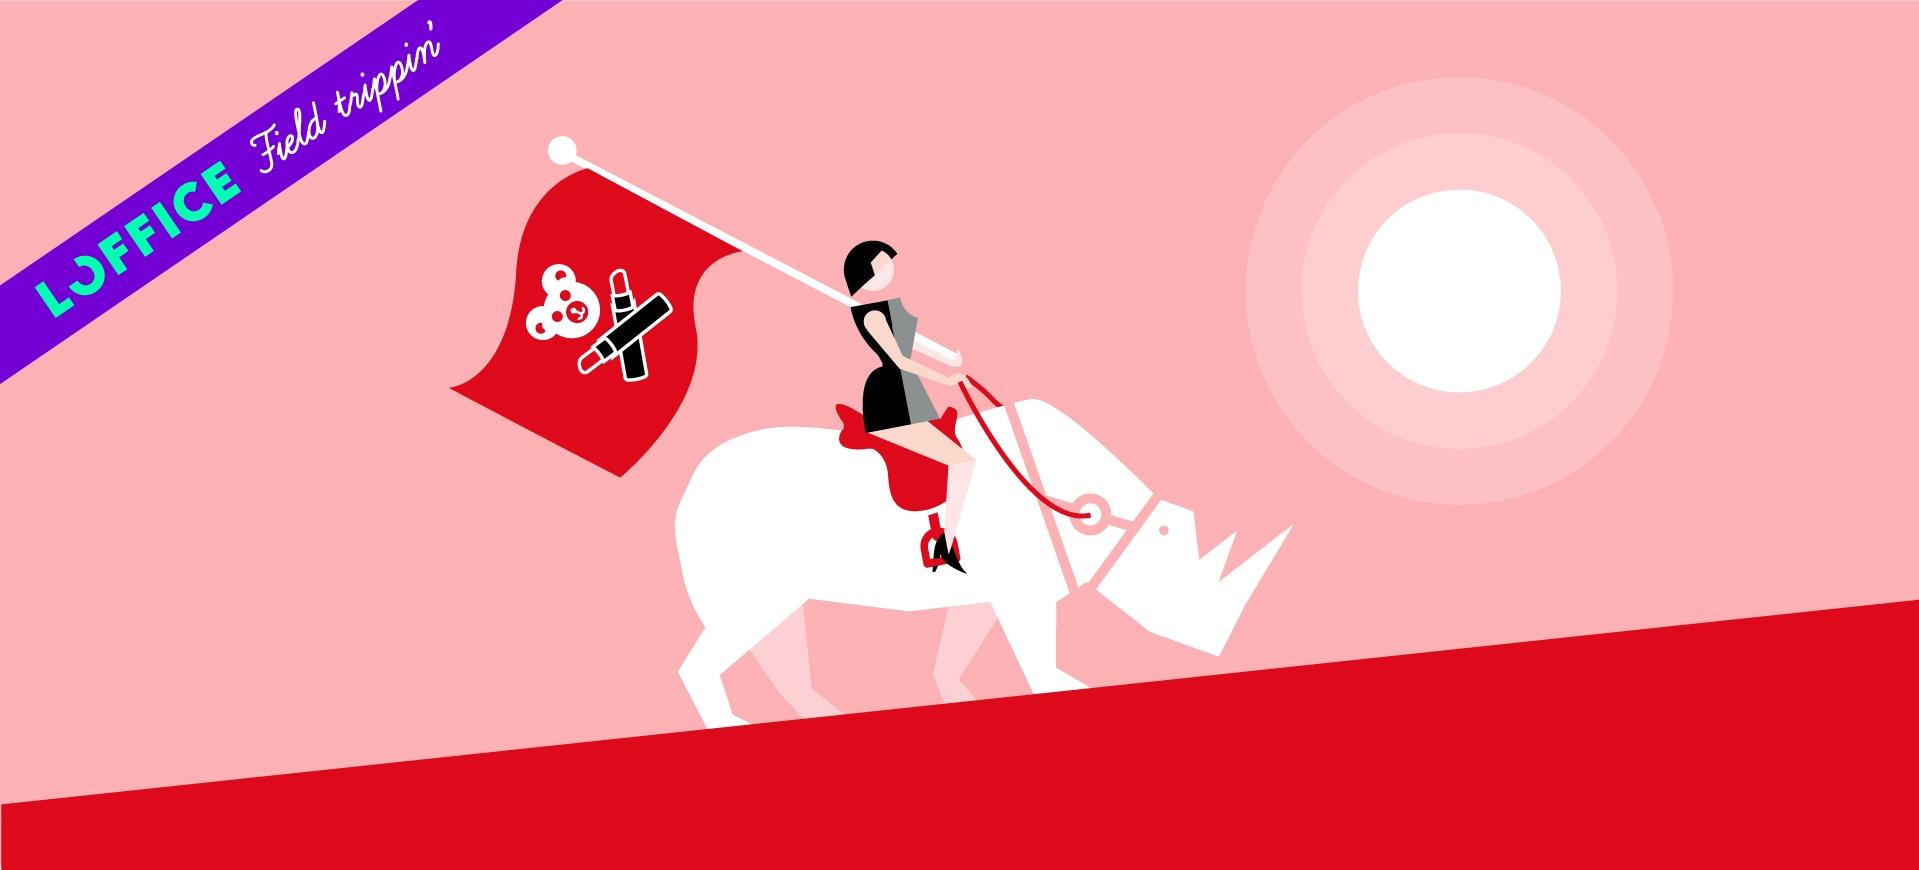 CocaCola_saddle_graphic.jpg